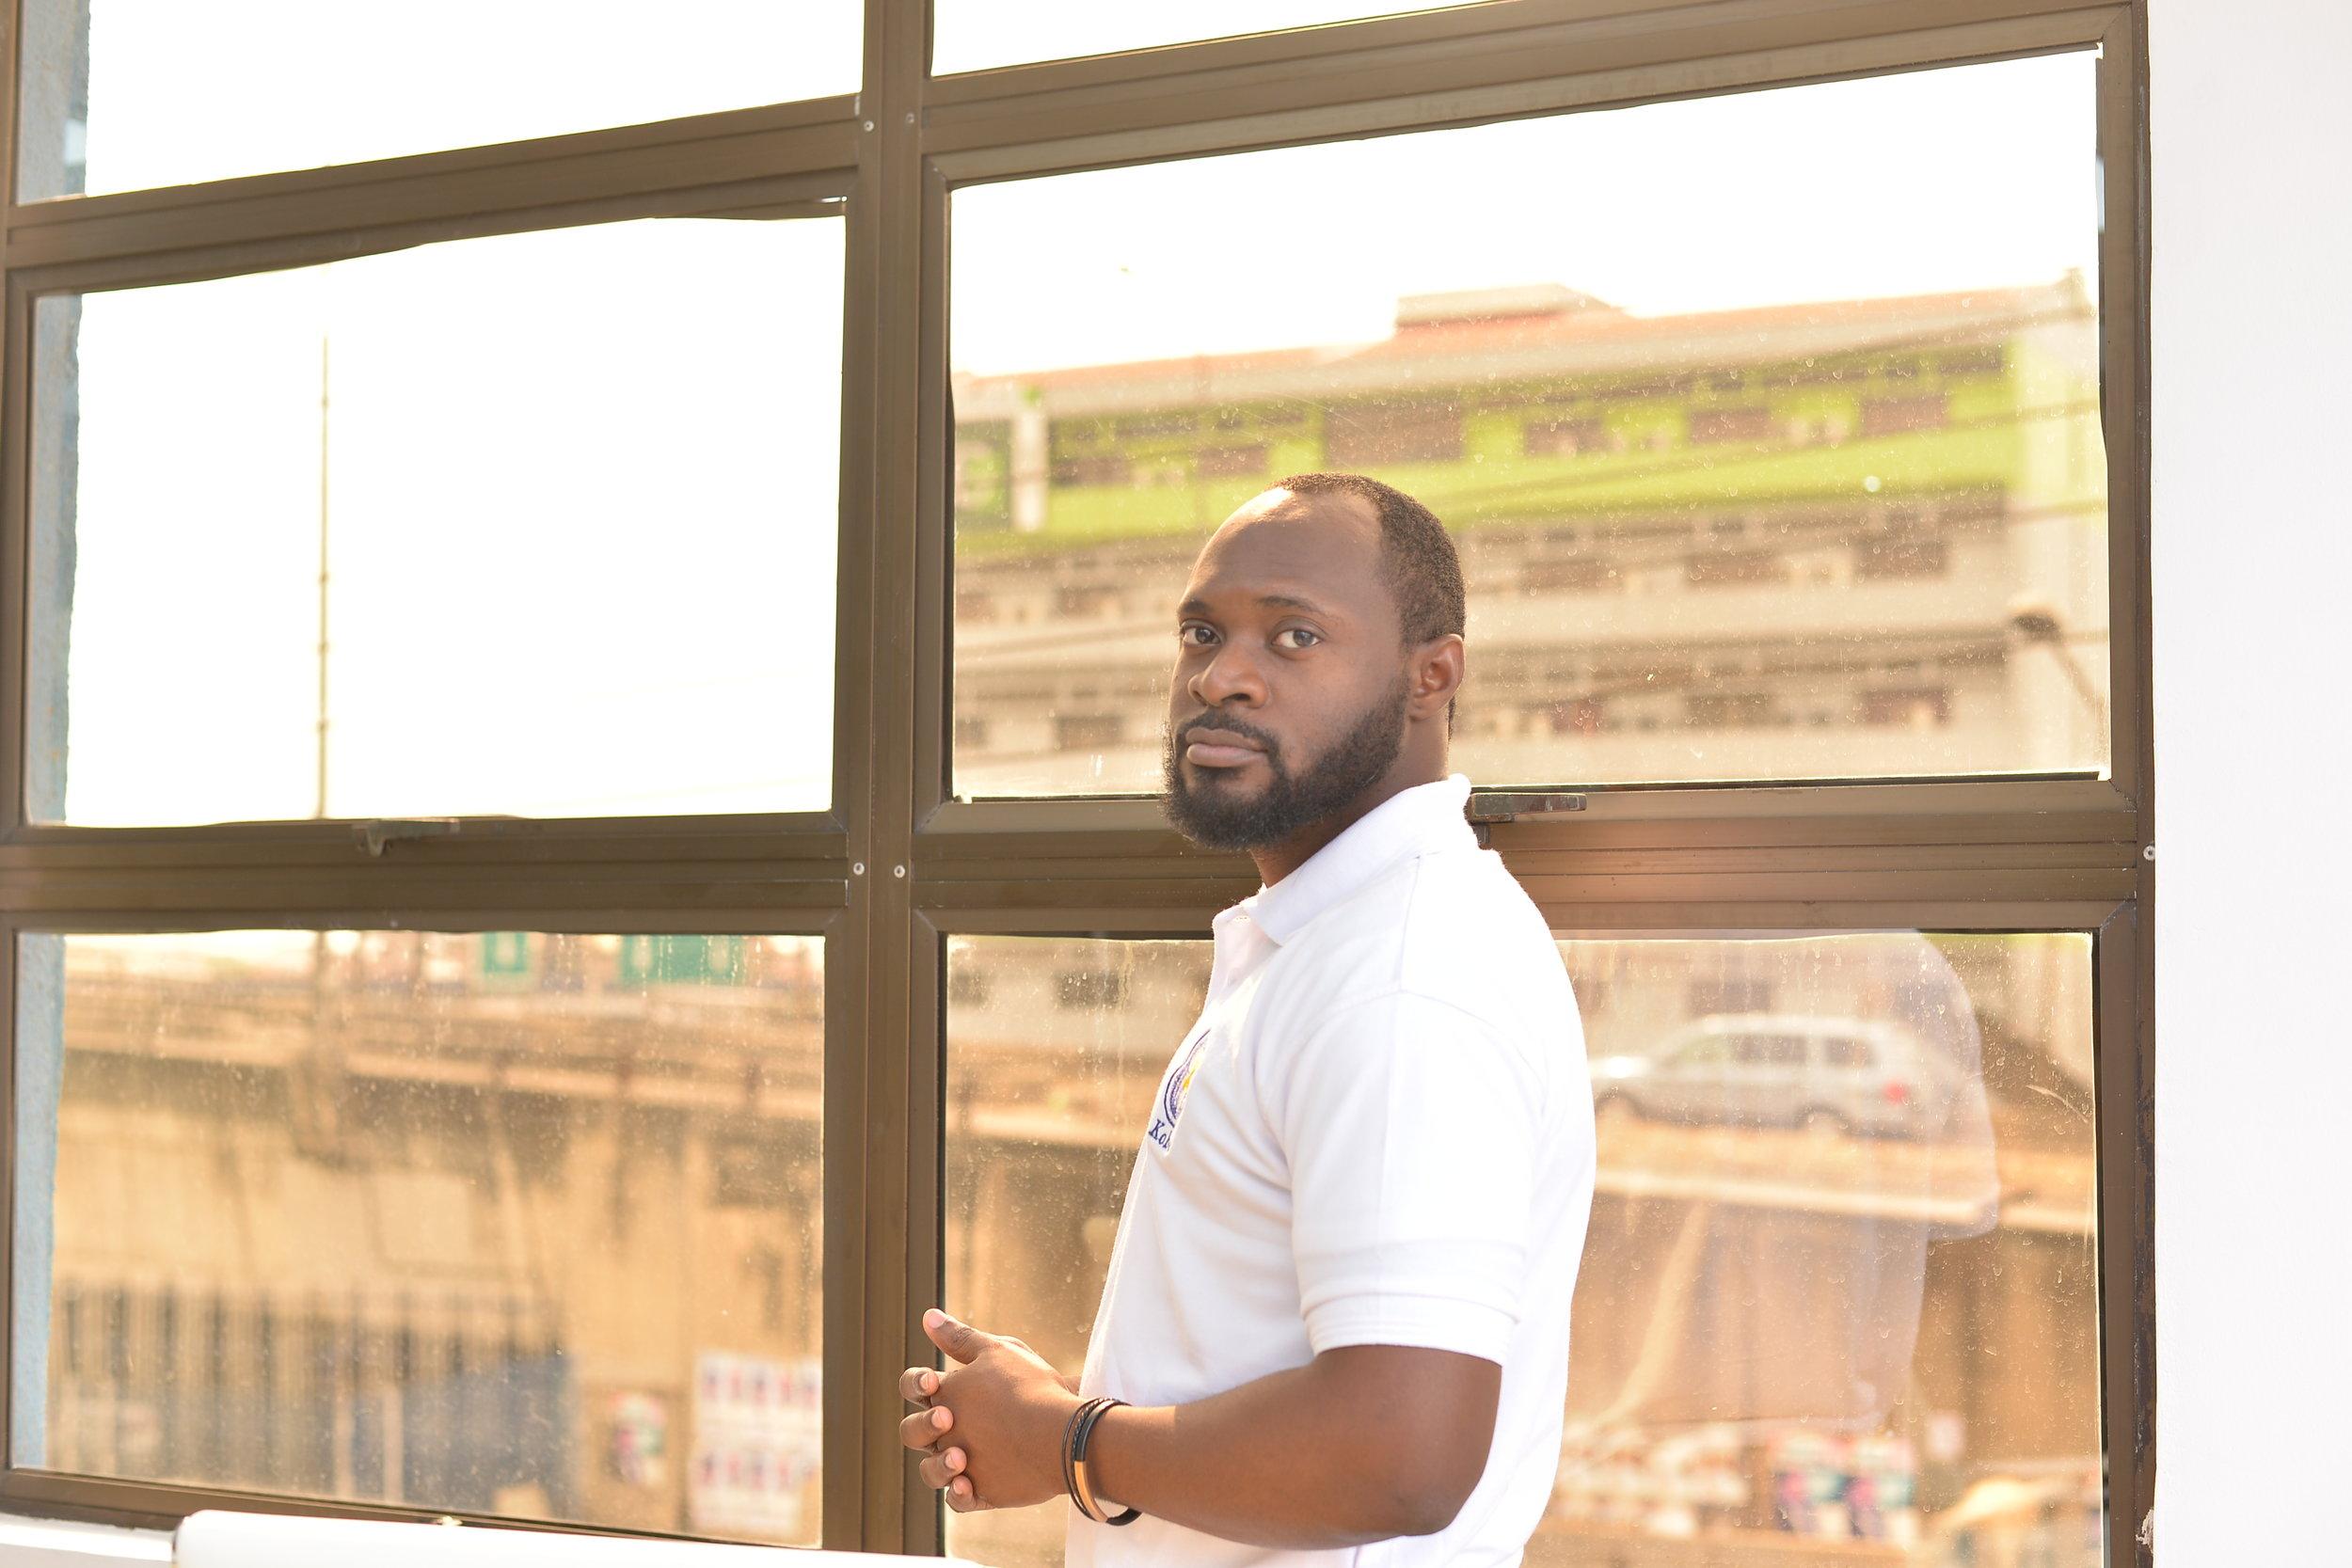 IFE OYEDELE II  Co-Founder & Chief Technical Officer, Kobo360